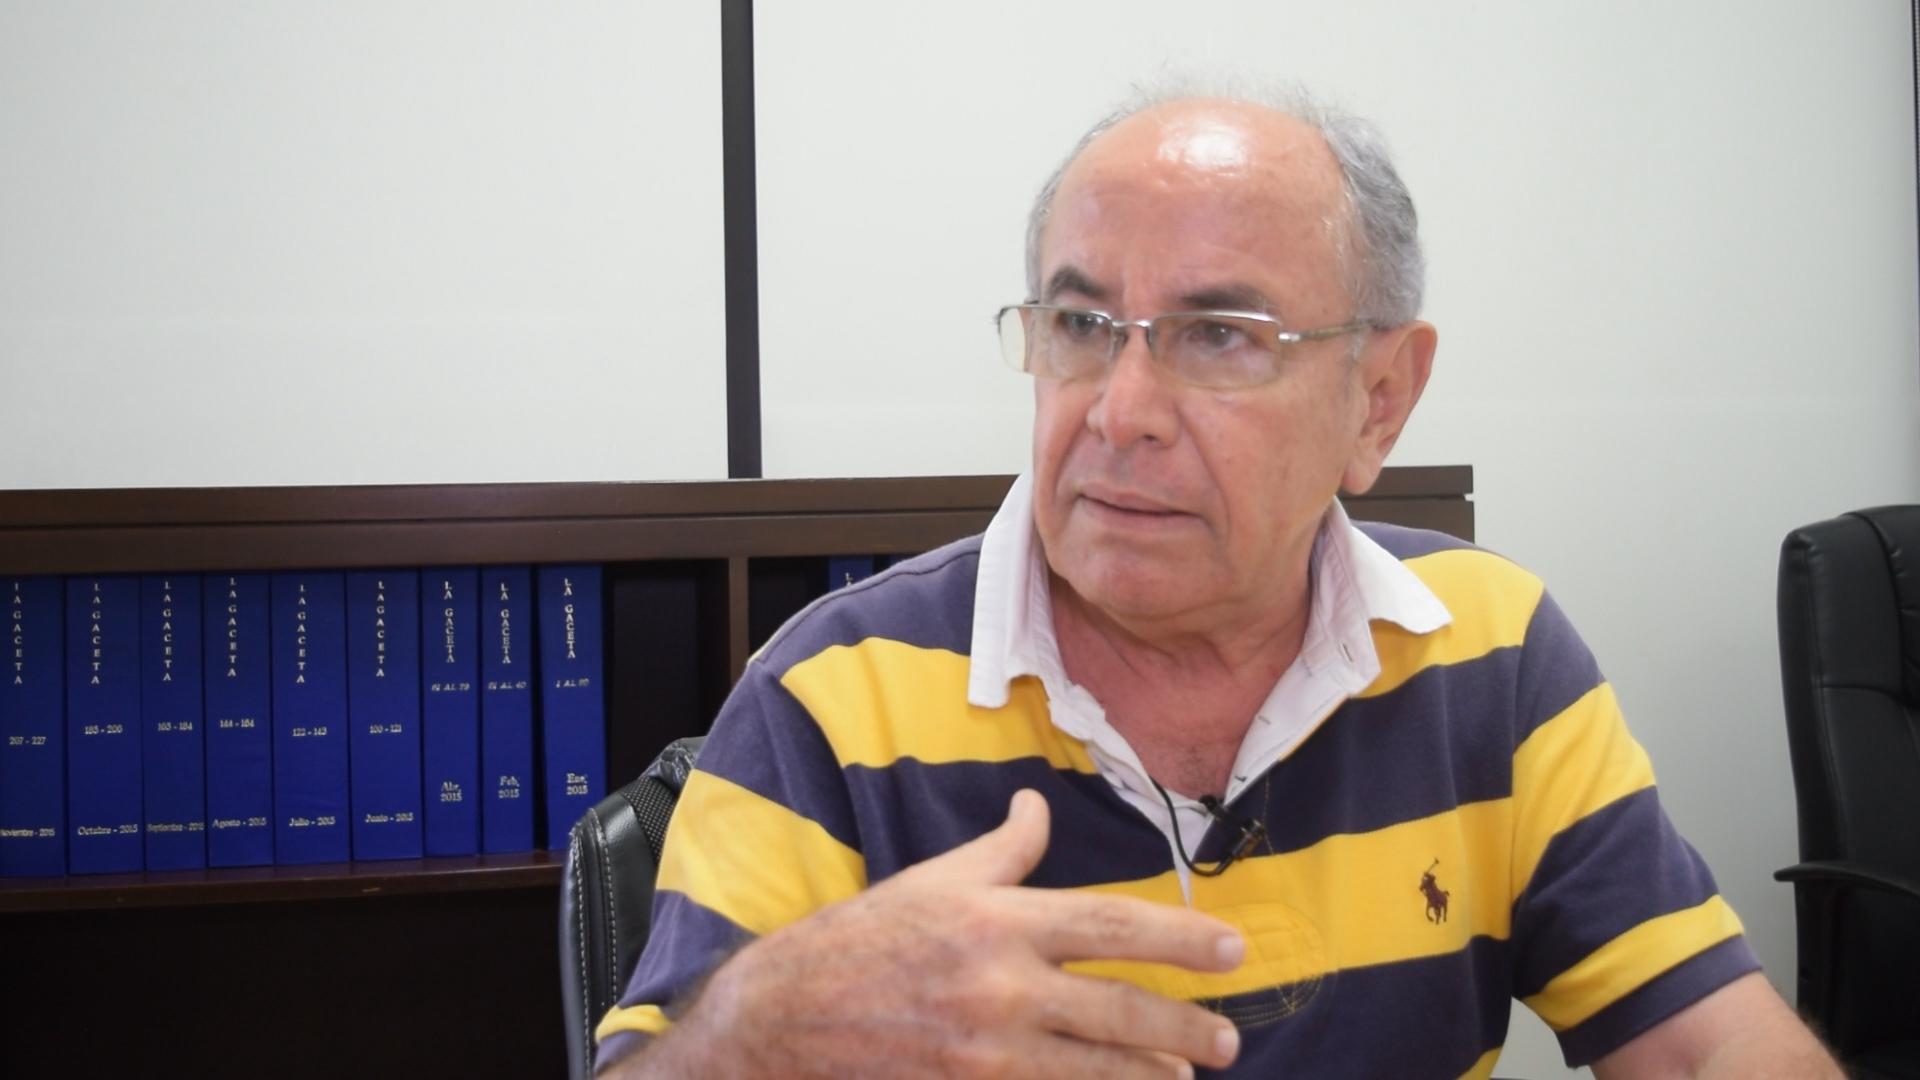 Agustín Jarquín Anaya, Ex aliado de Daniel Ortega